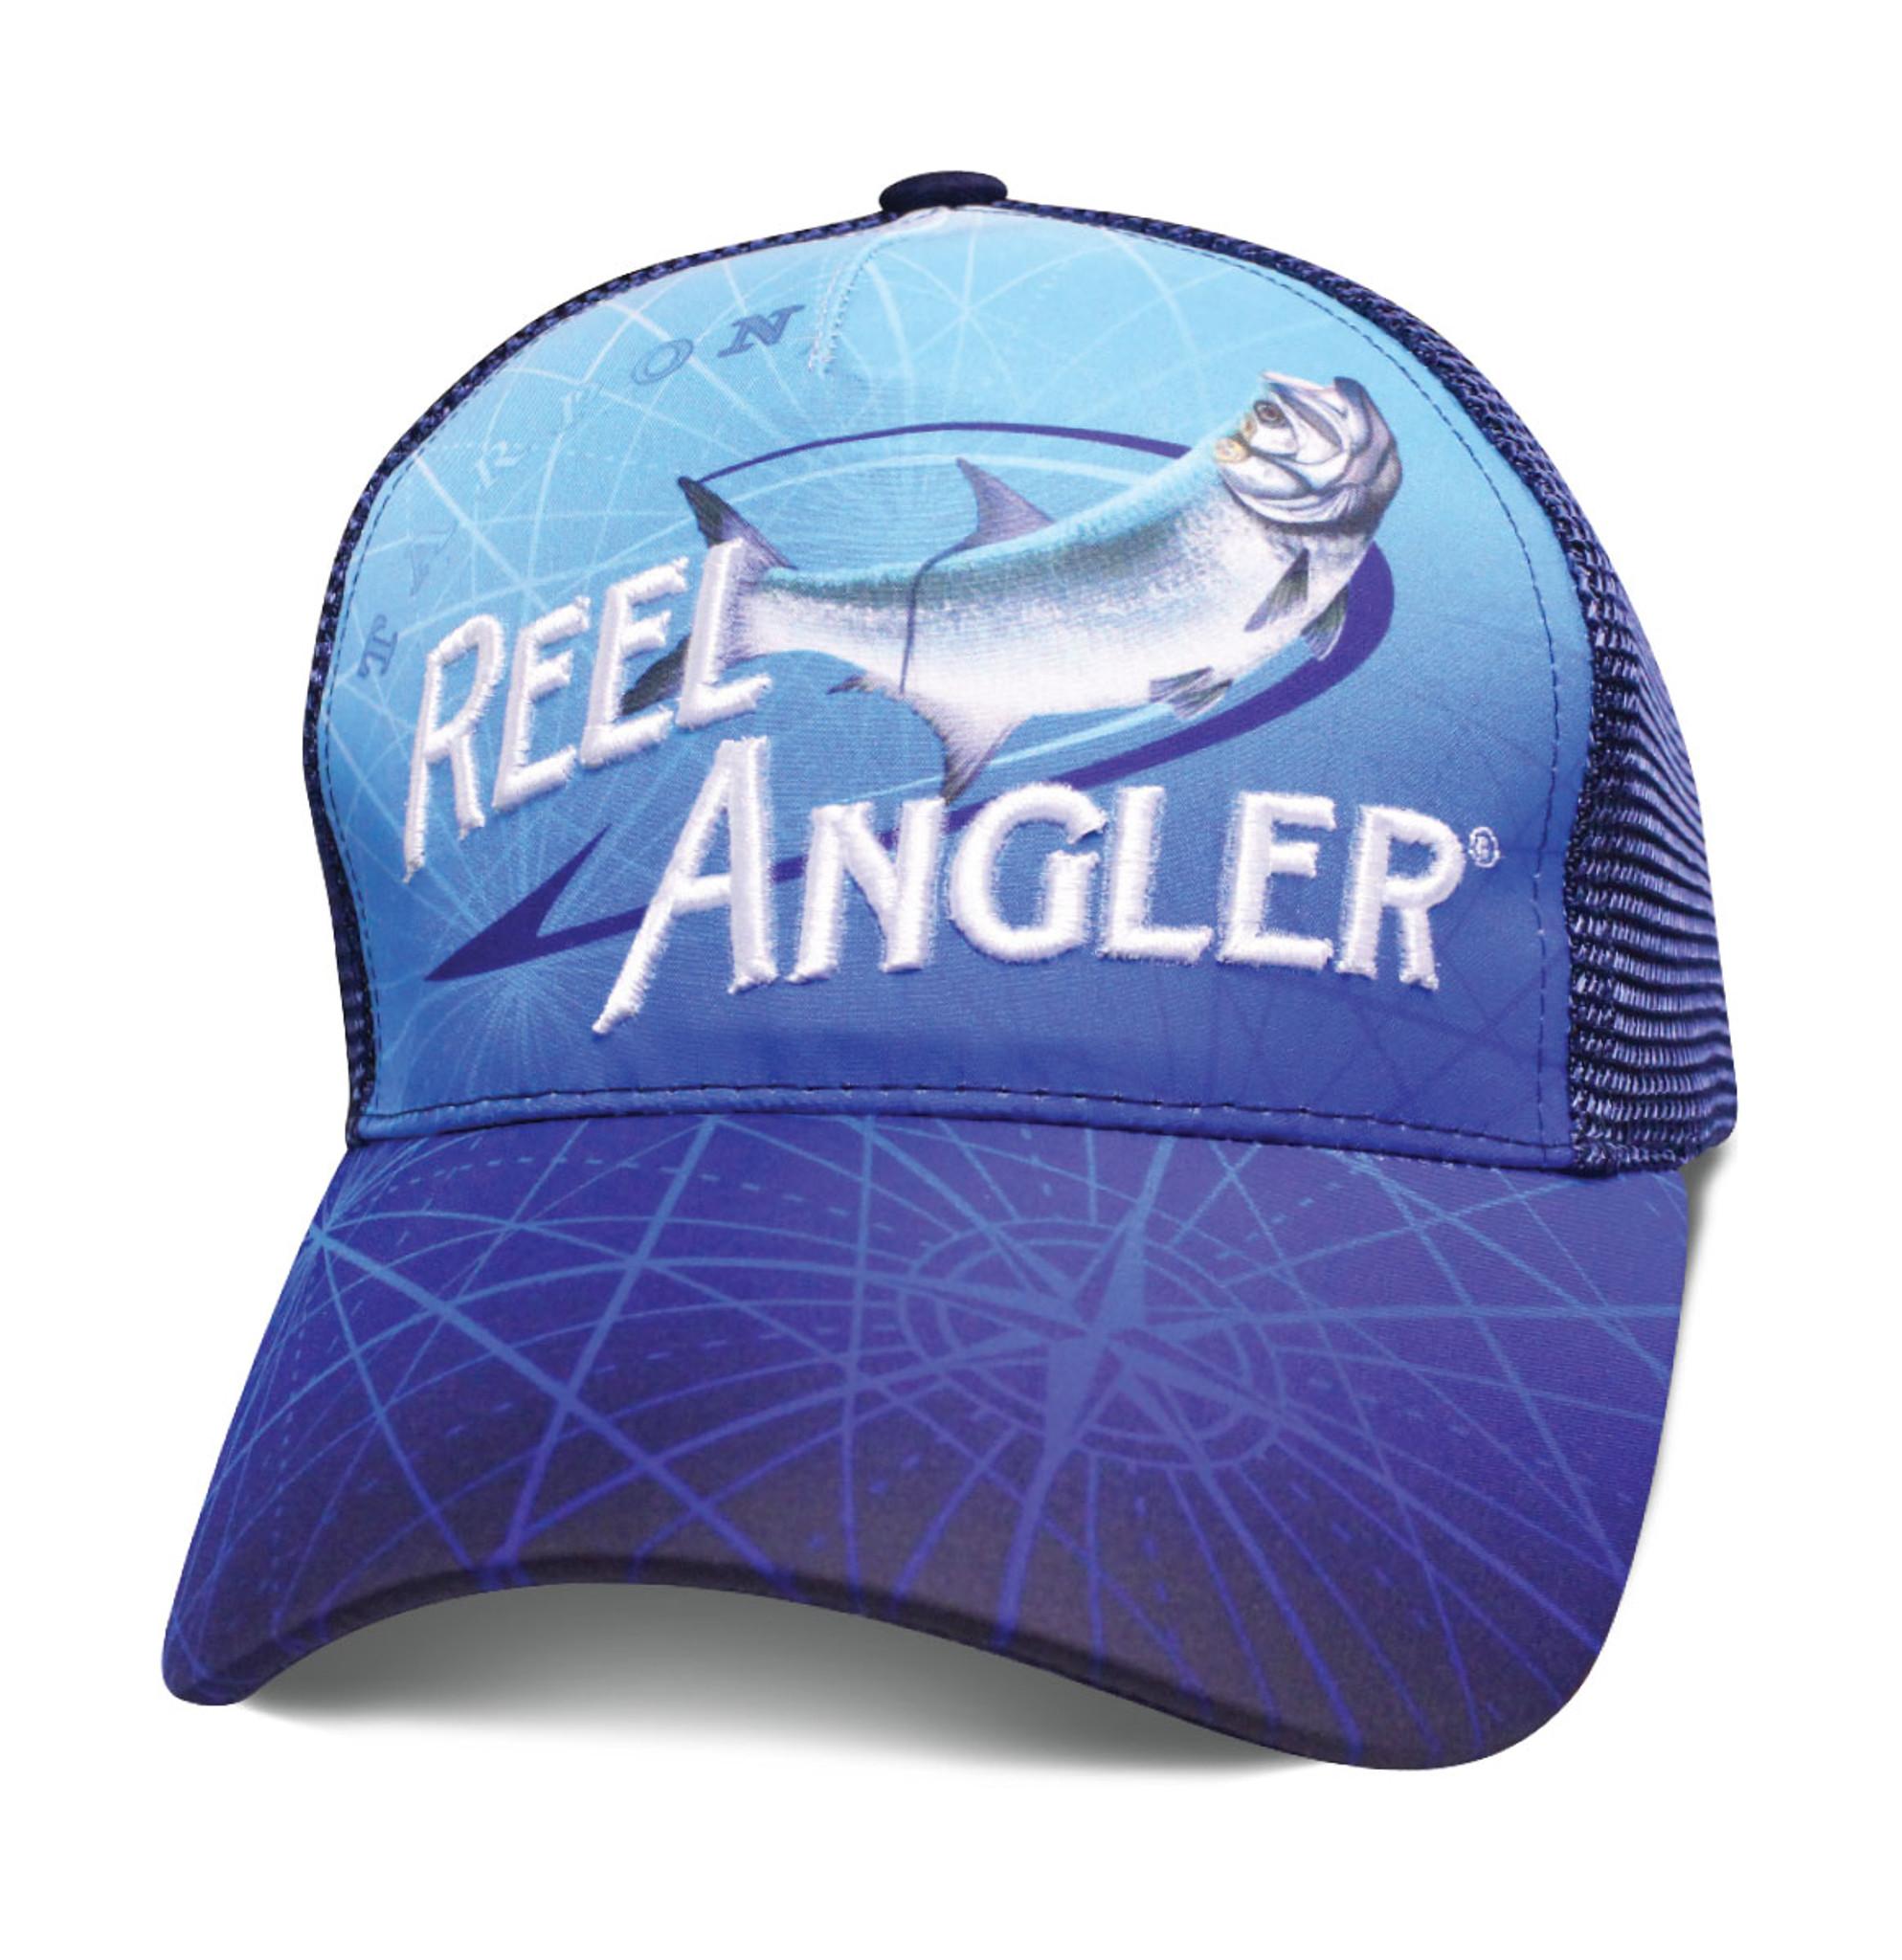 5e3a88b604c74 Reel Angler Chartered Tropics  Tarpon - I Hate Hats